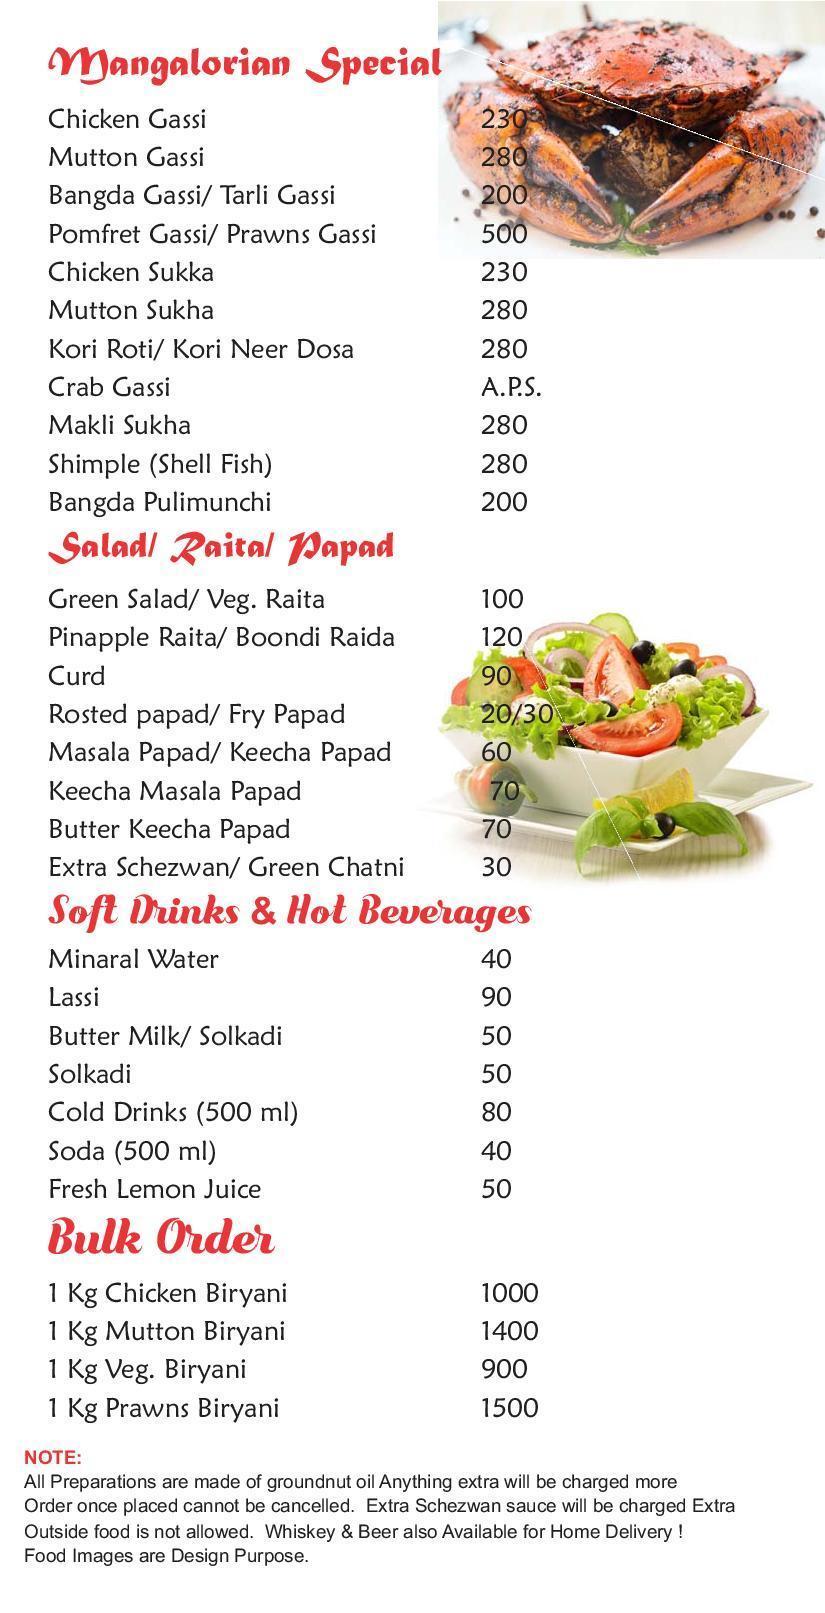 Sai Sannidhi Restaurant & Bar menu 5